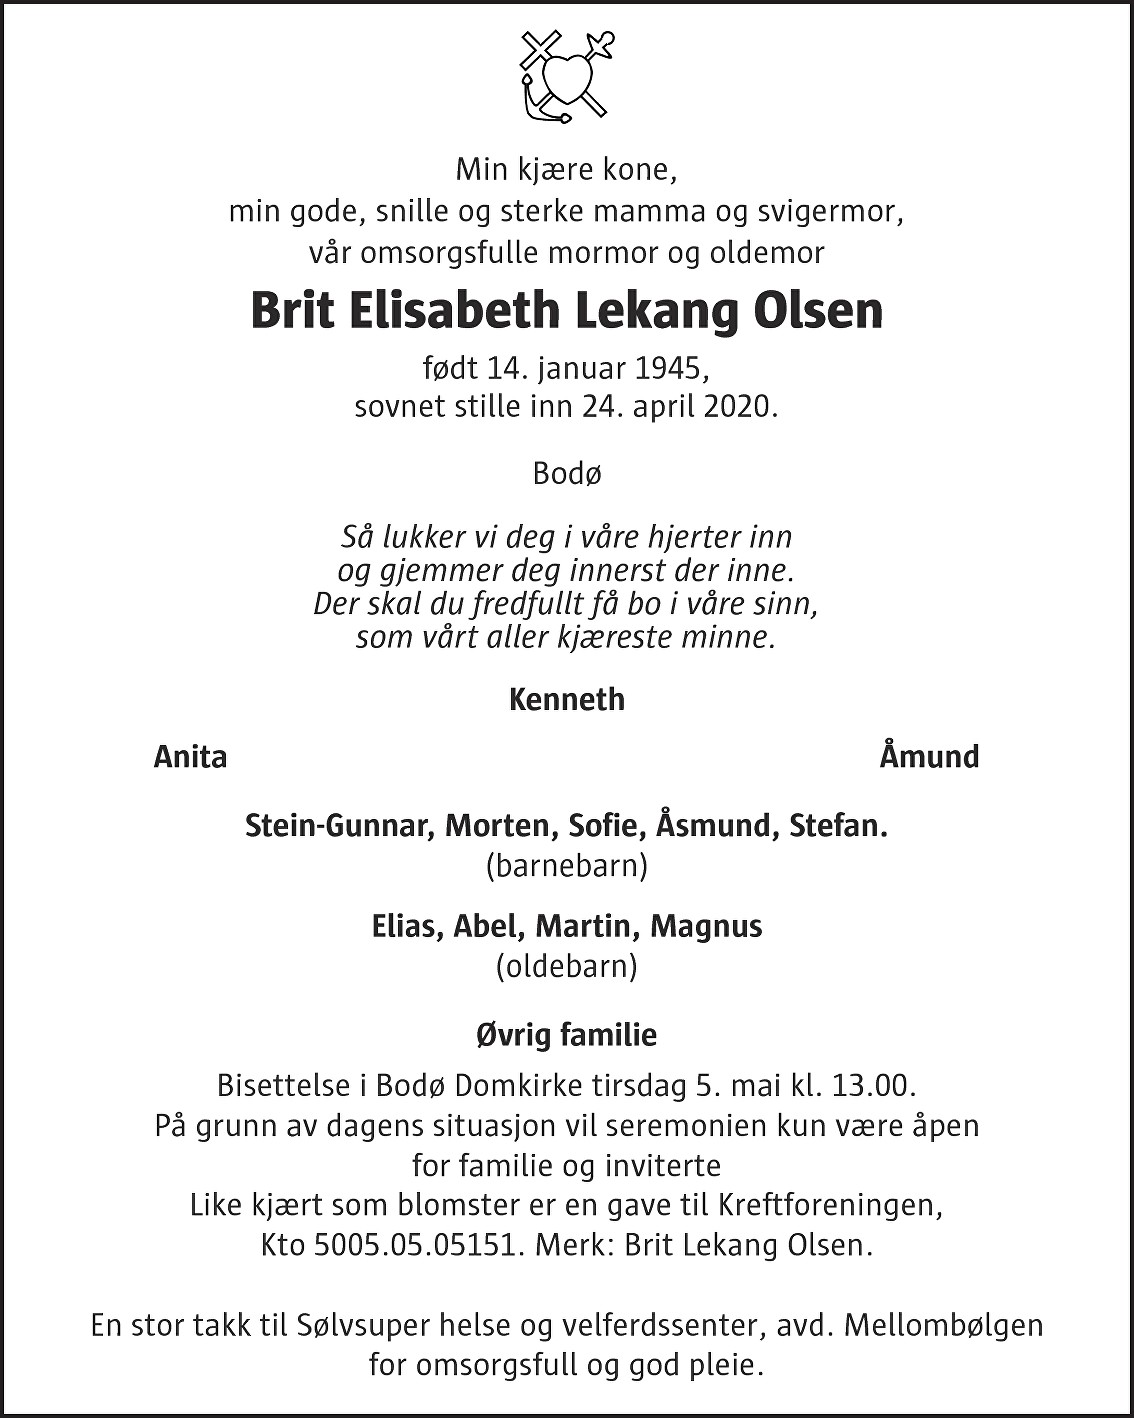 Brit Elisabeth Lekang Olsen Dødsannonse